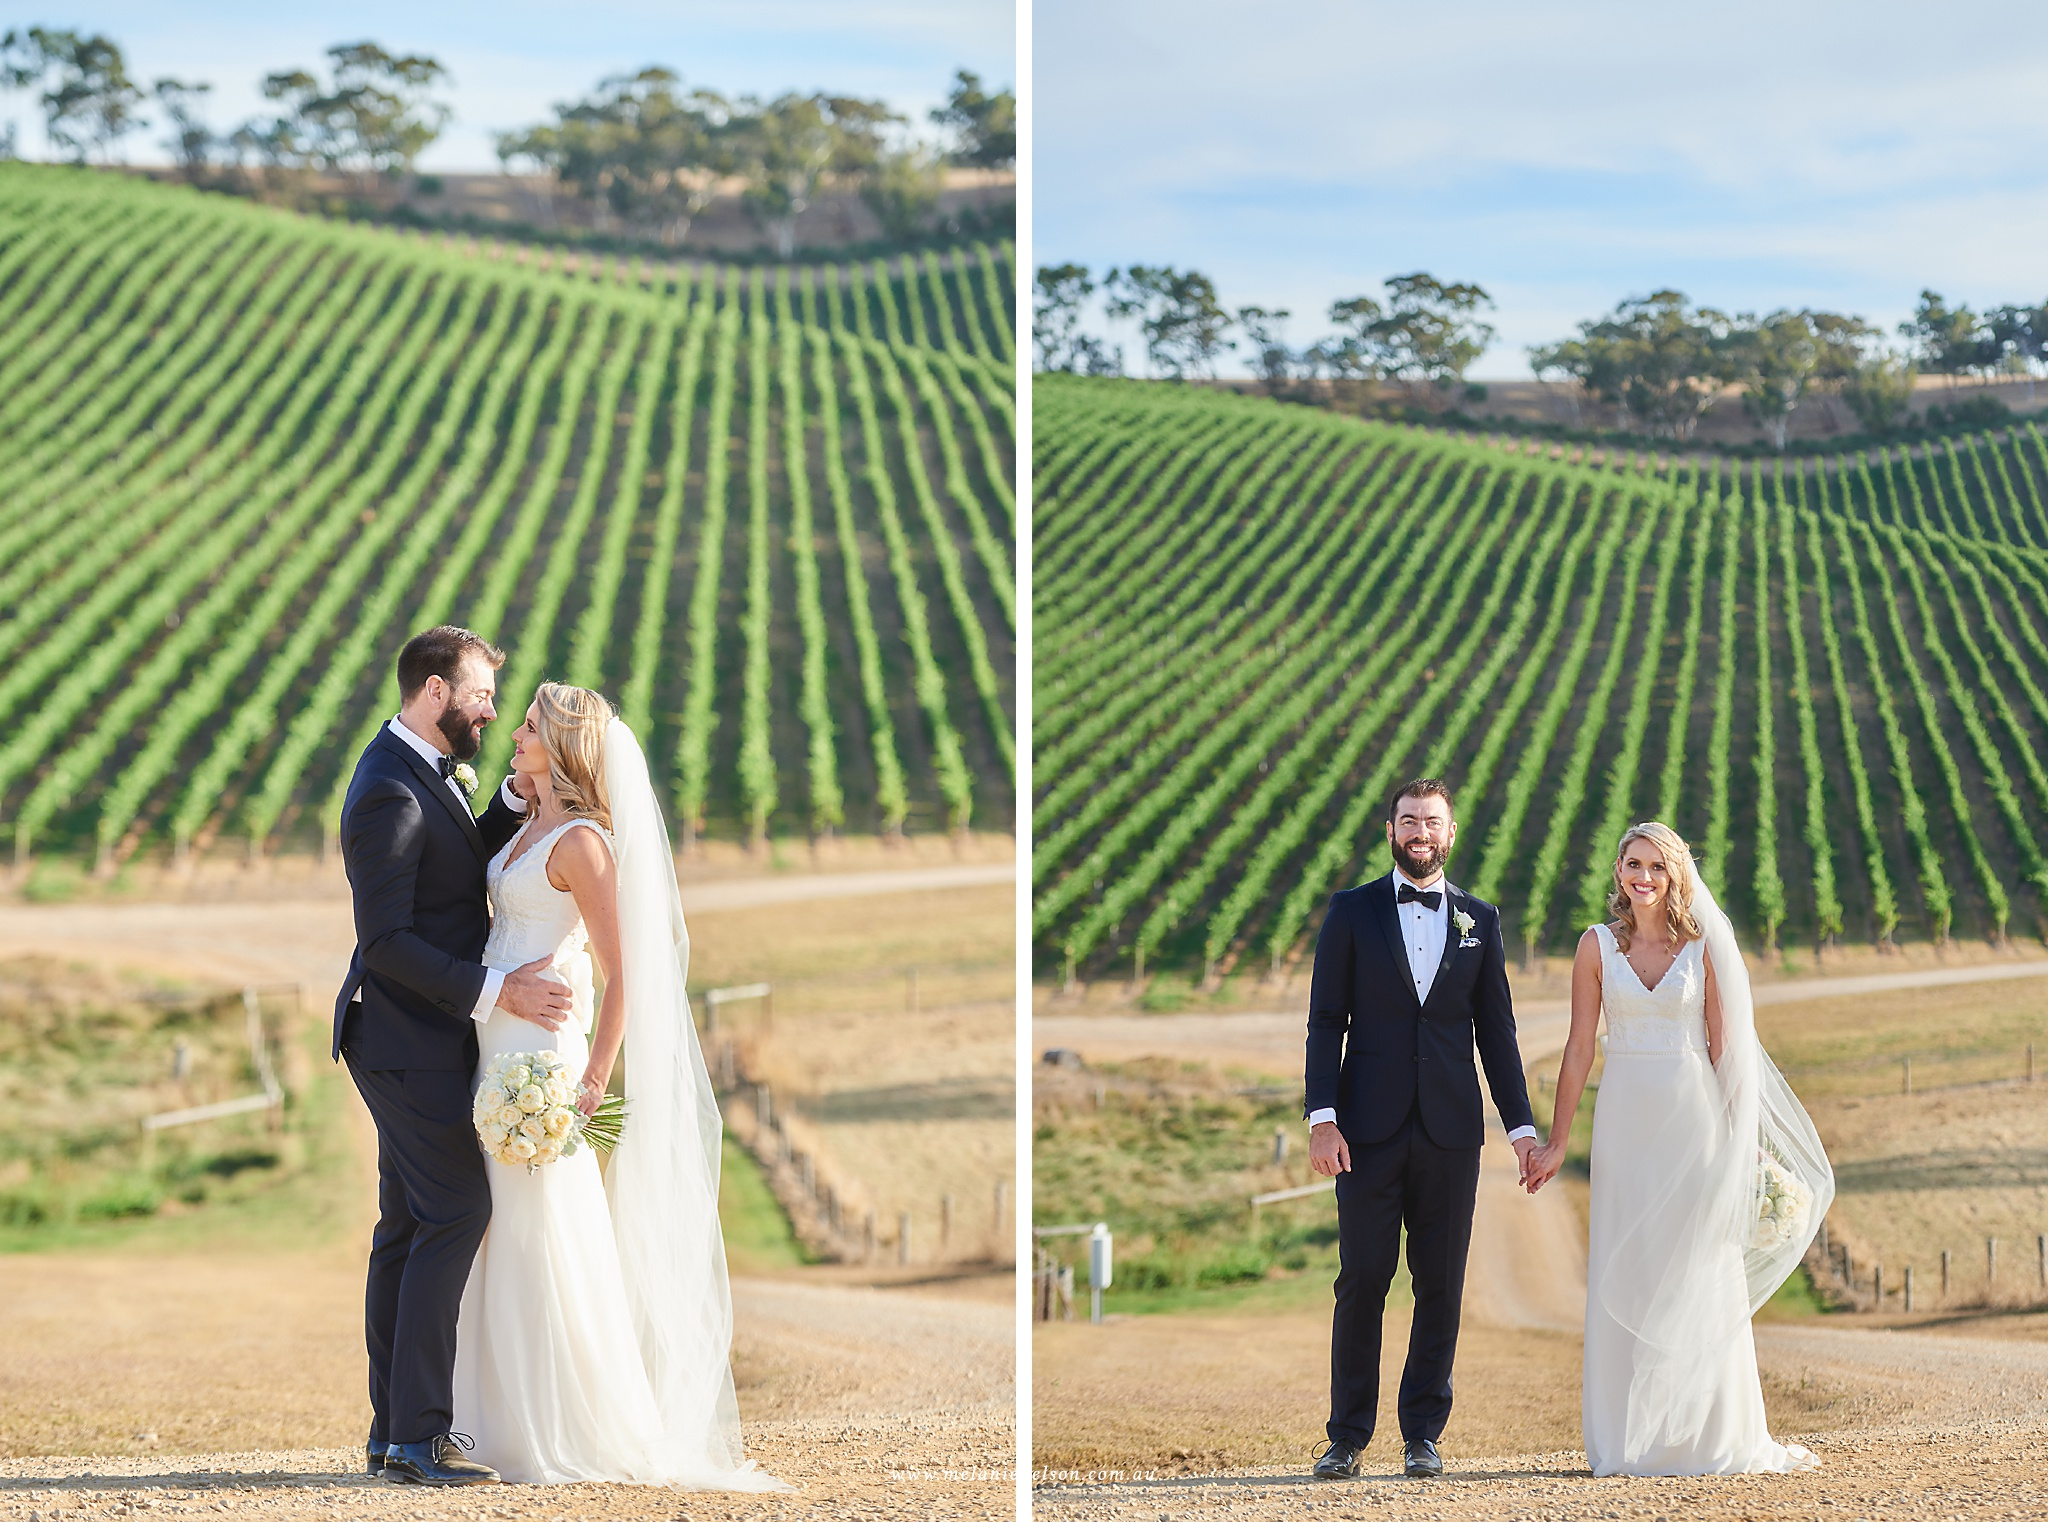 longview_vineyard_wedding_0060.jpg